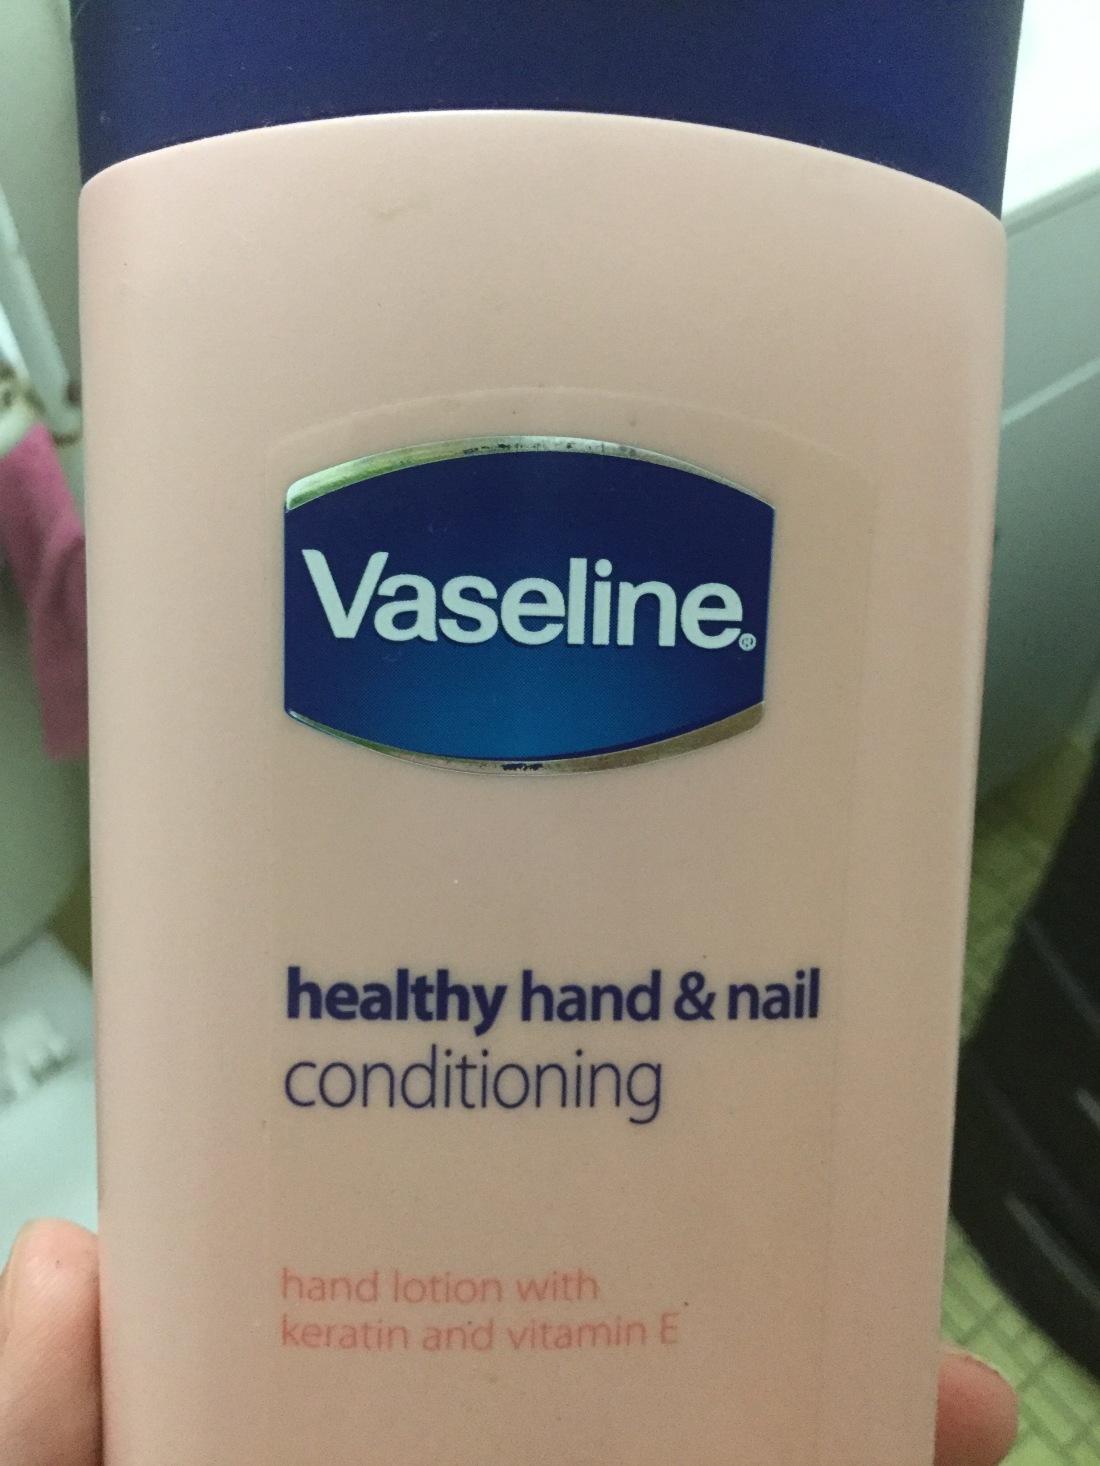 Vaseline hand lotion